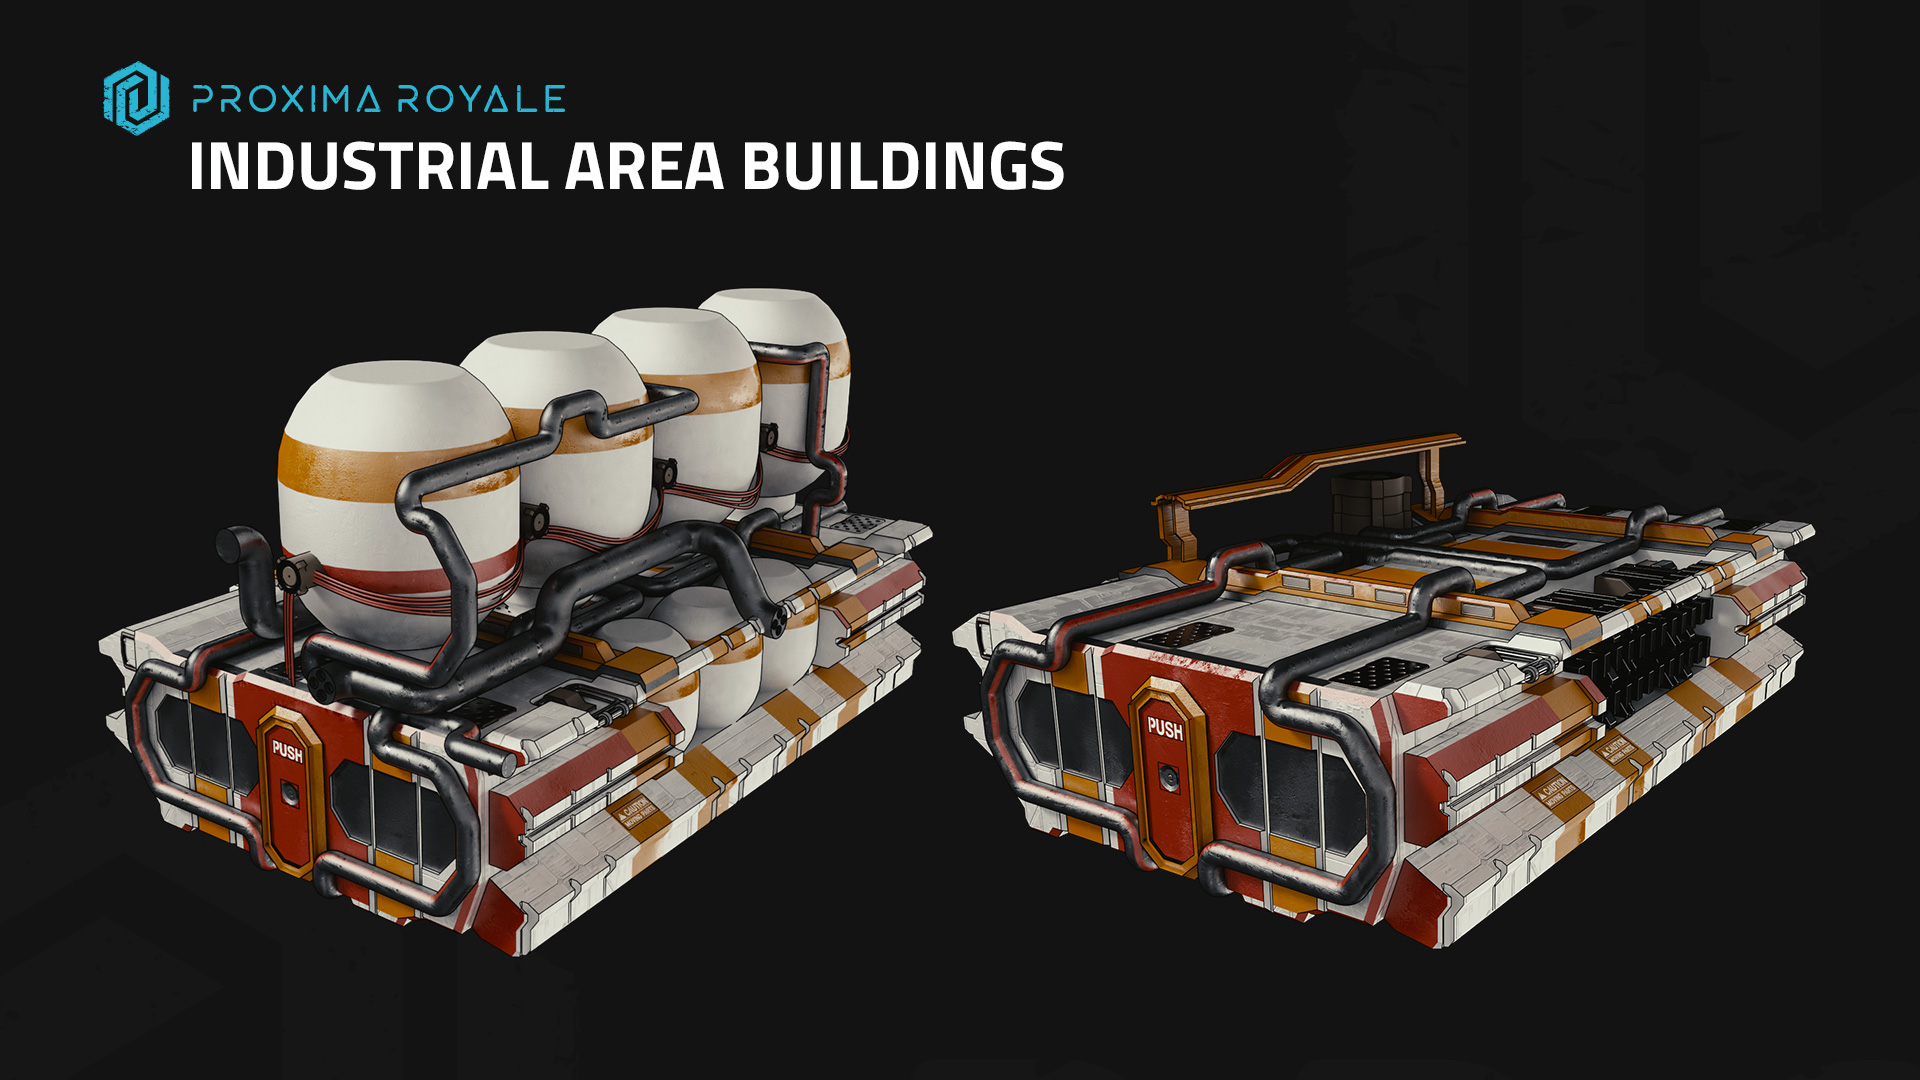 2 industrial area buildings 2